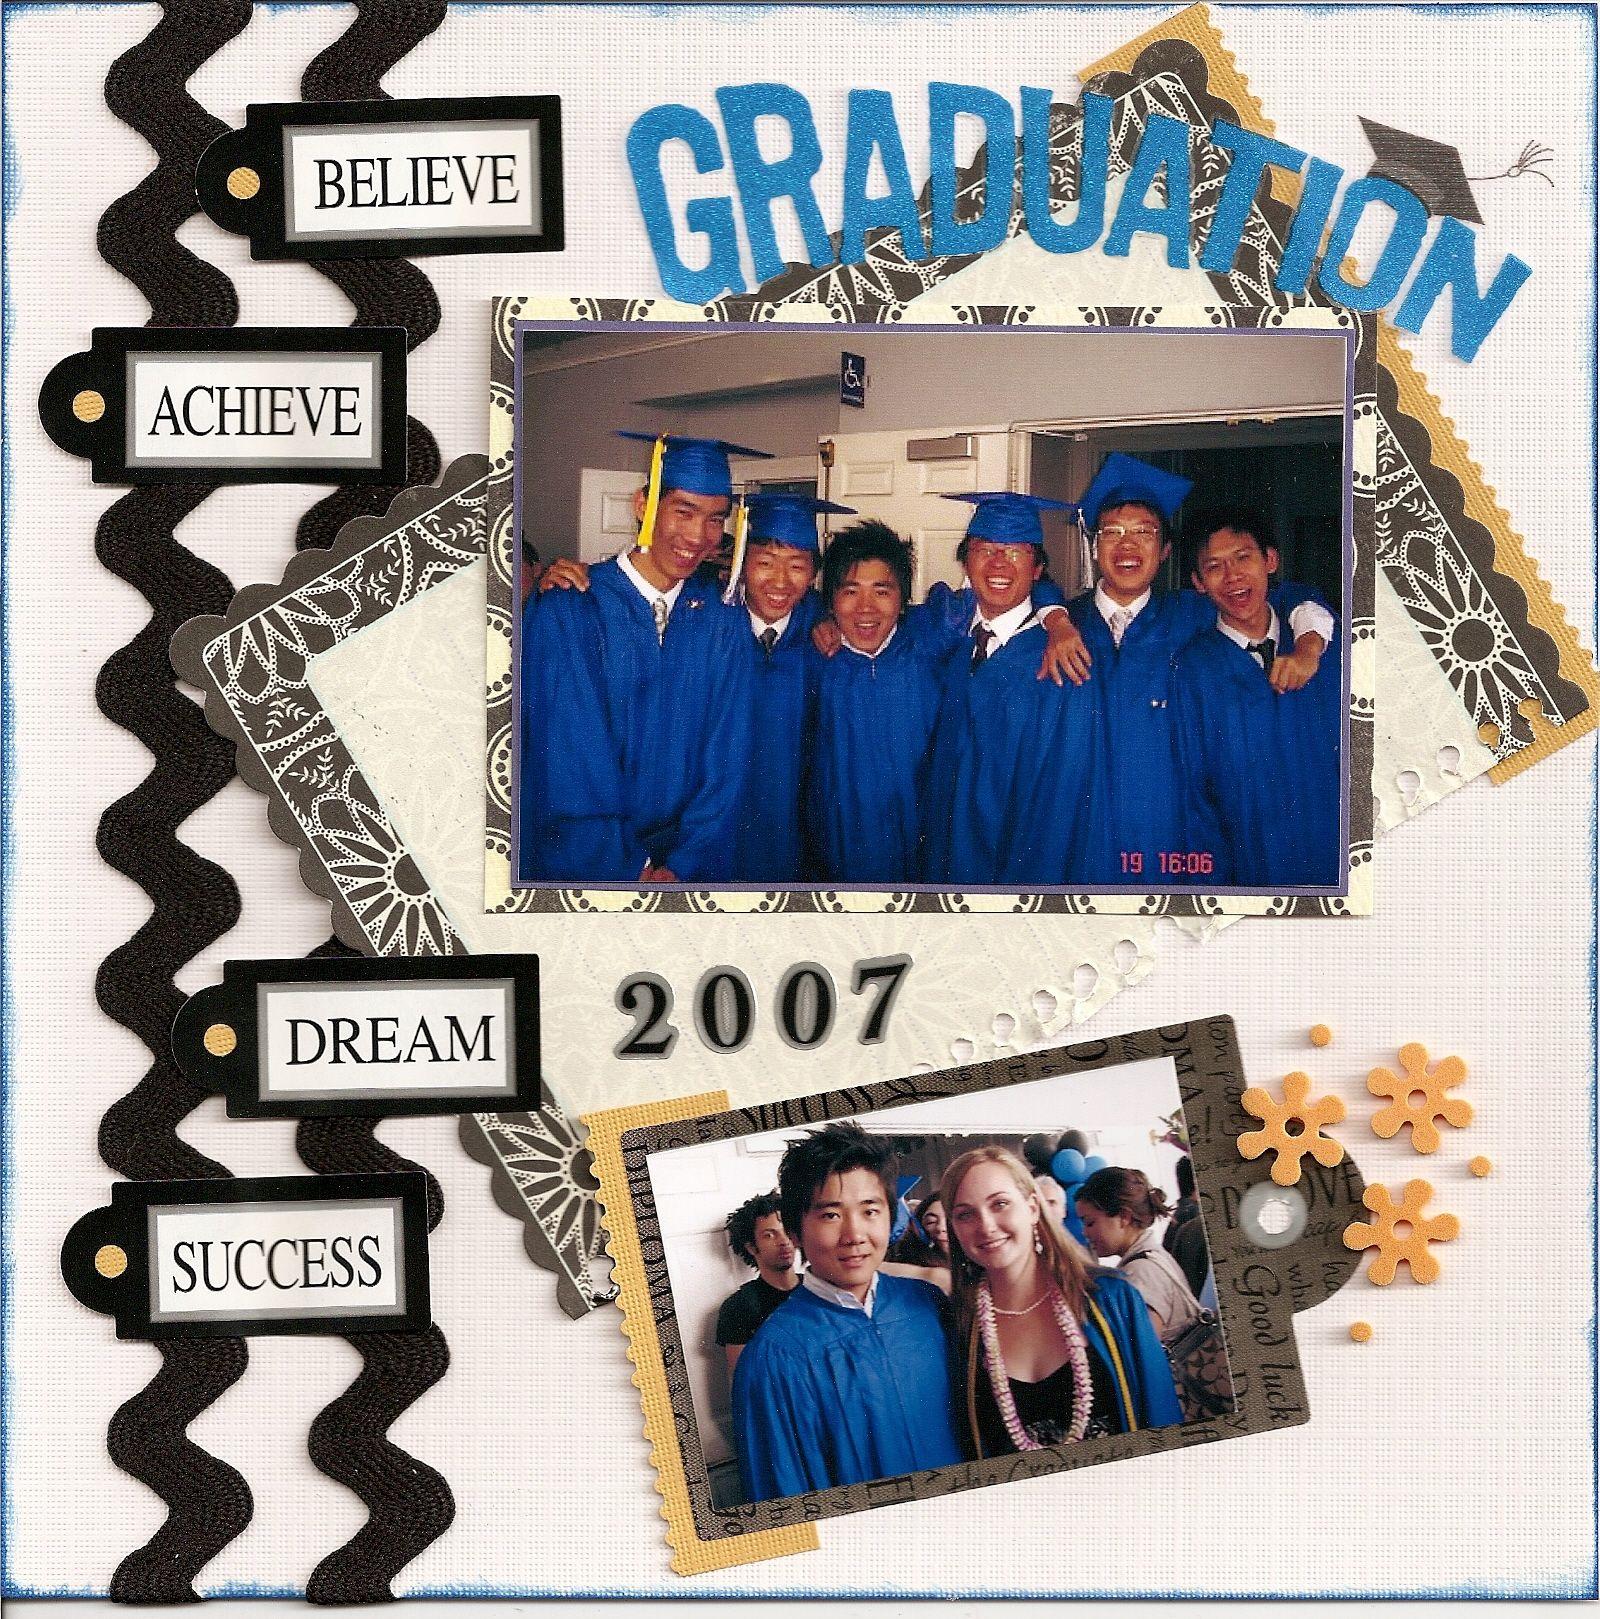 Graduation scrapbook ideas pinterest - Hs Graduation 2007 Scrapbook Com